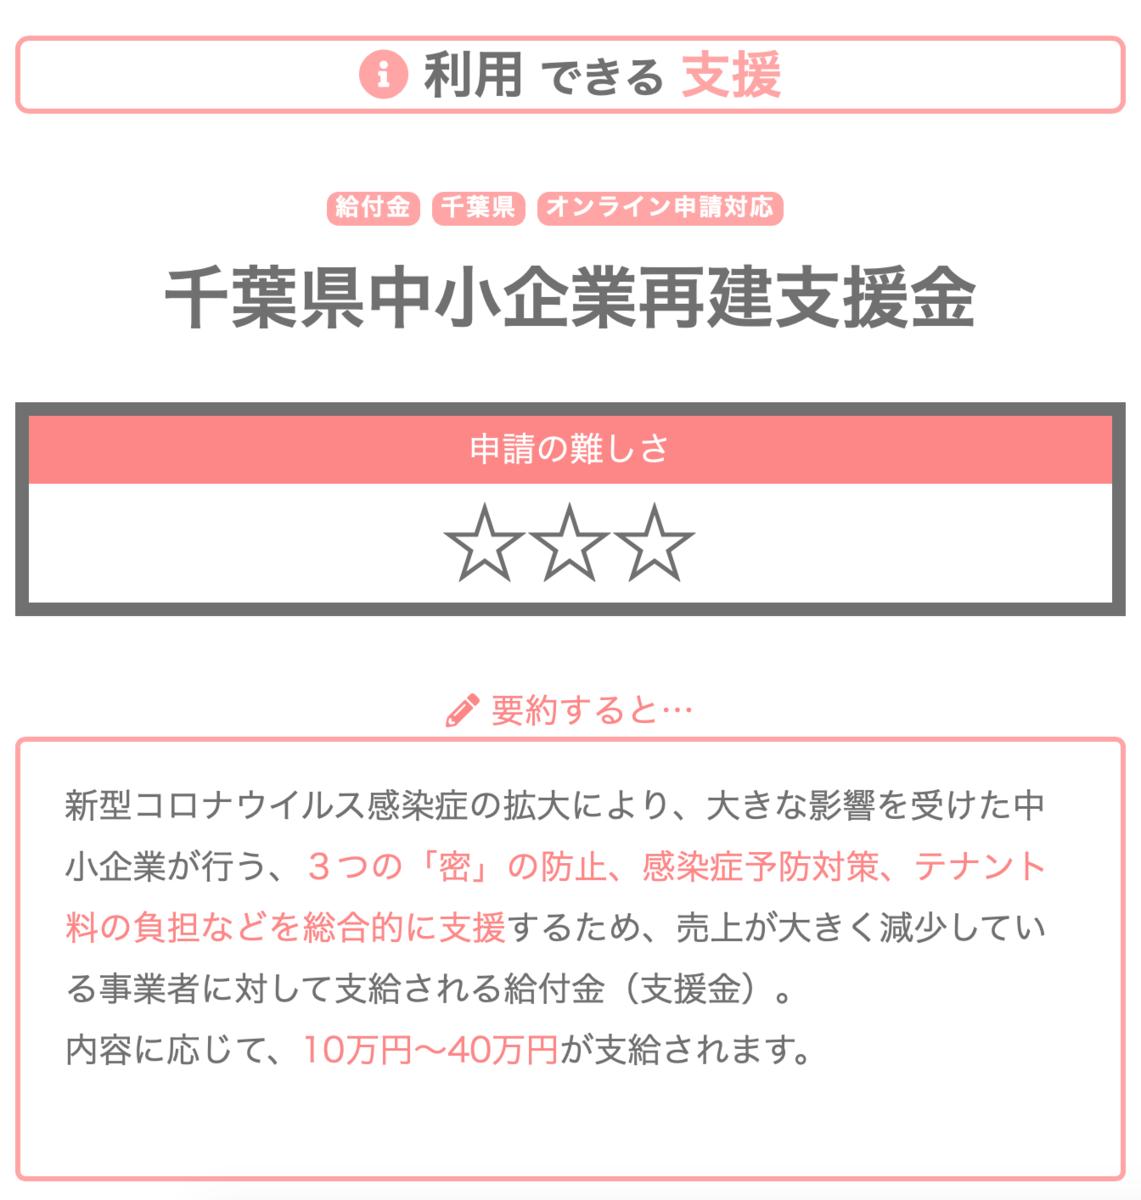 f:id:socialcamp:20200523165212p:plain